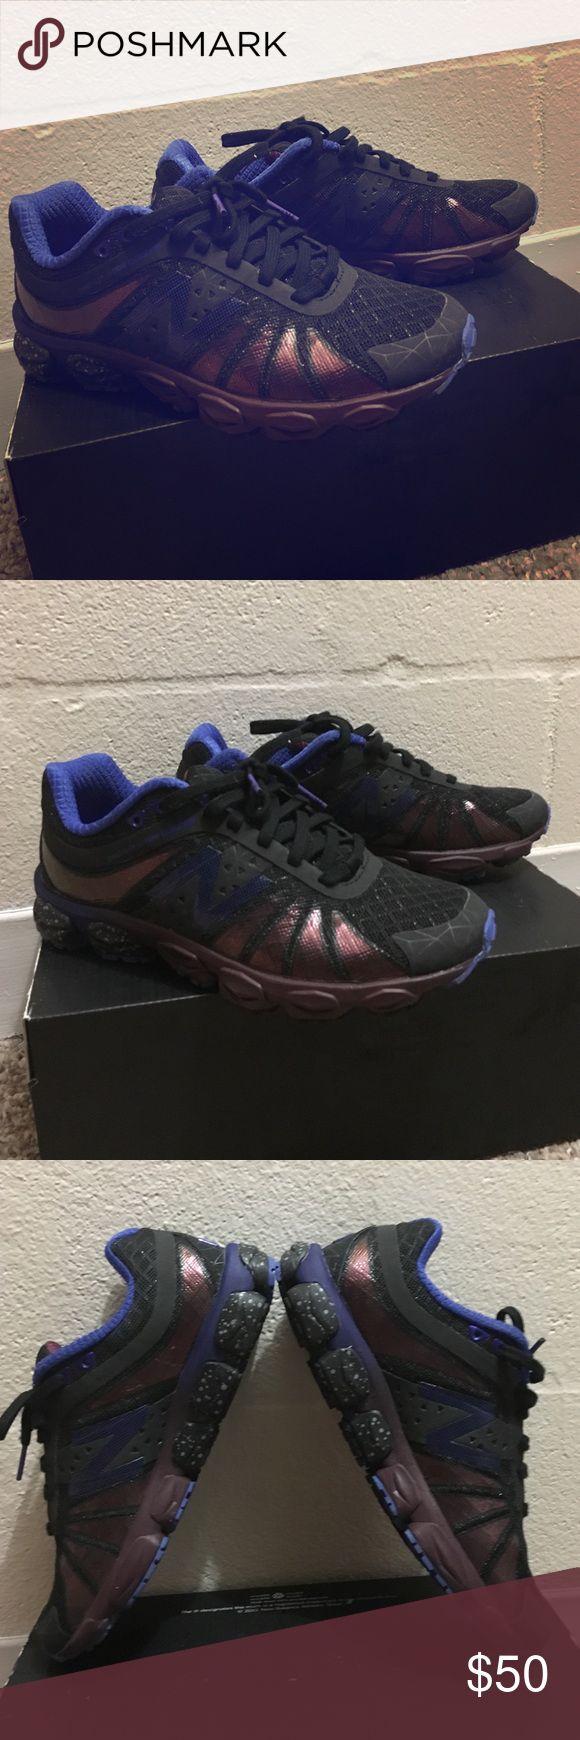 Rare 890 New Balance Running New Balance Women's Running. W890HKO Size 7 Medium Width. Like new condition! New Balance Shoes Sneakers